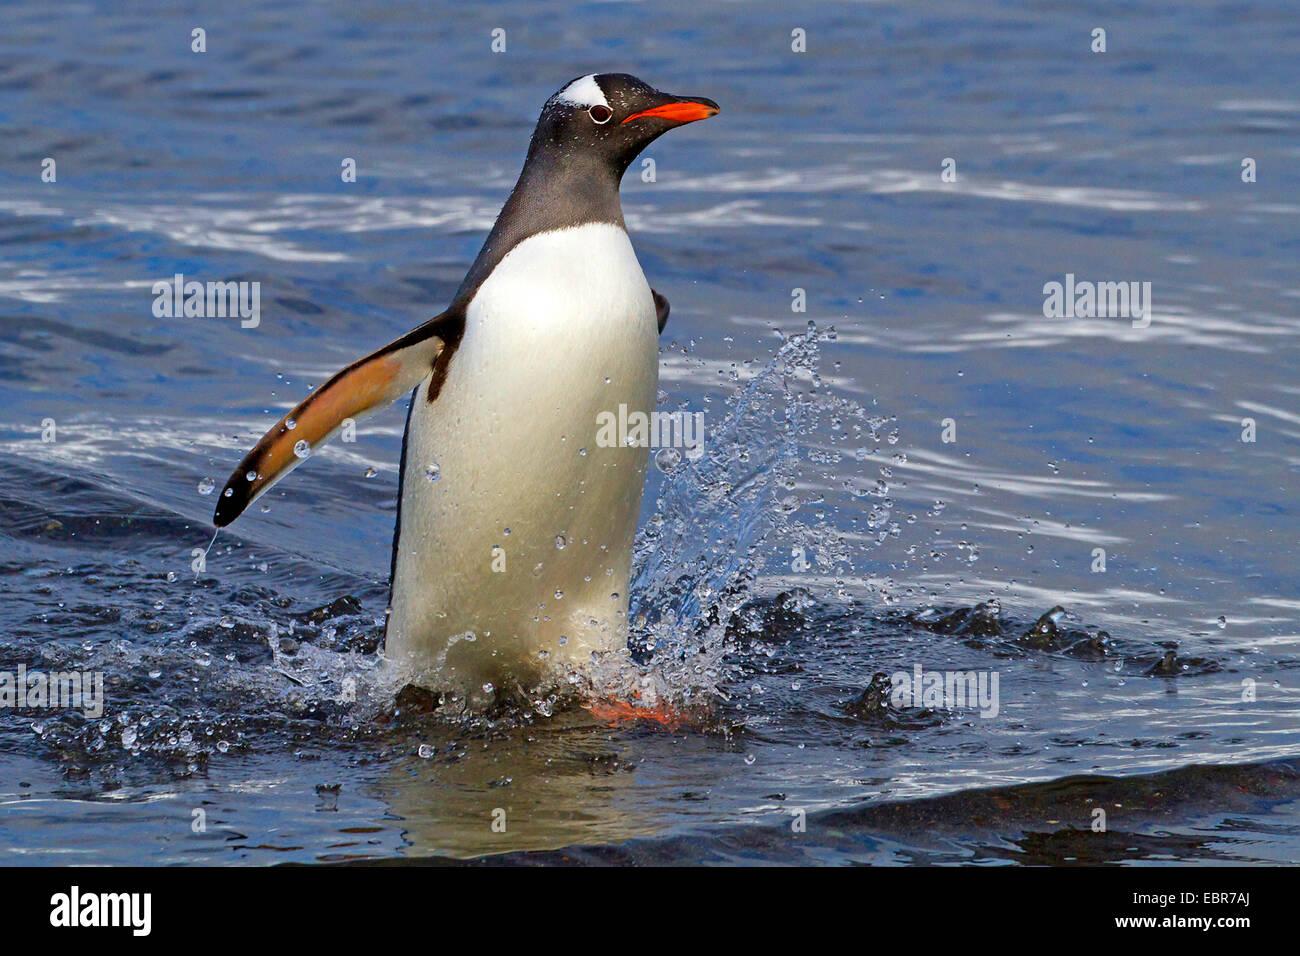 Gentoo Penguin (Pygoscelis Papua), verlassen das Meer, Antarktis, Falkland Inseln, Insel der Sirenen Stockbild